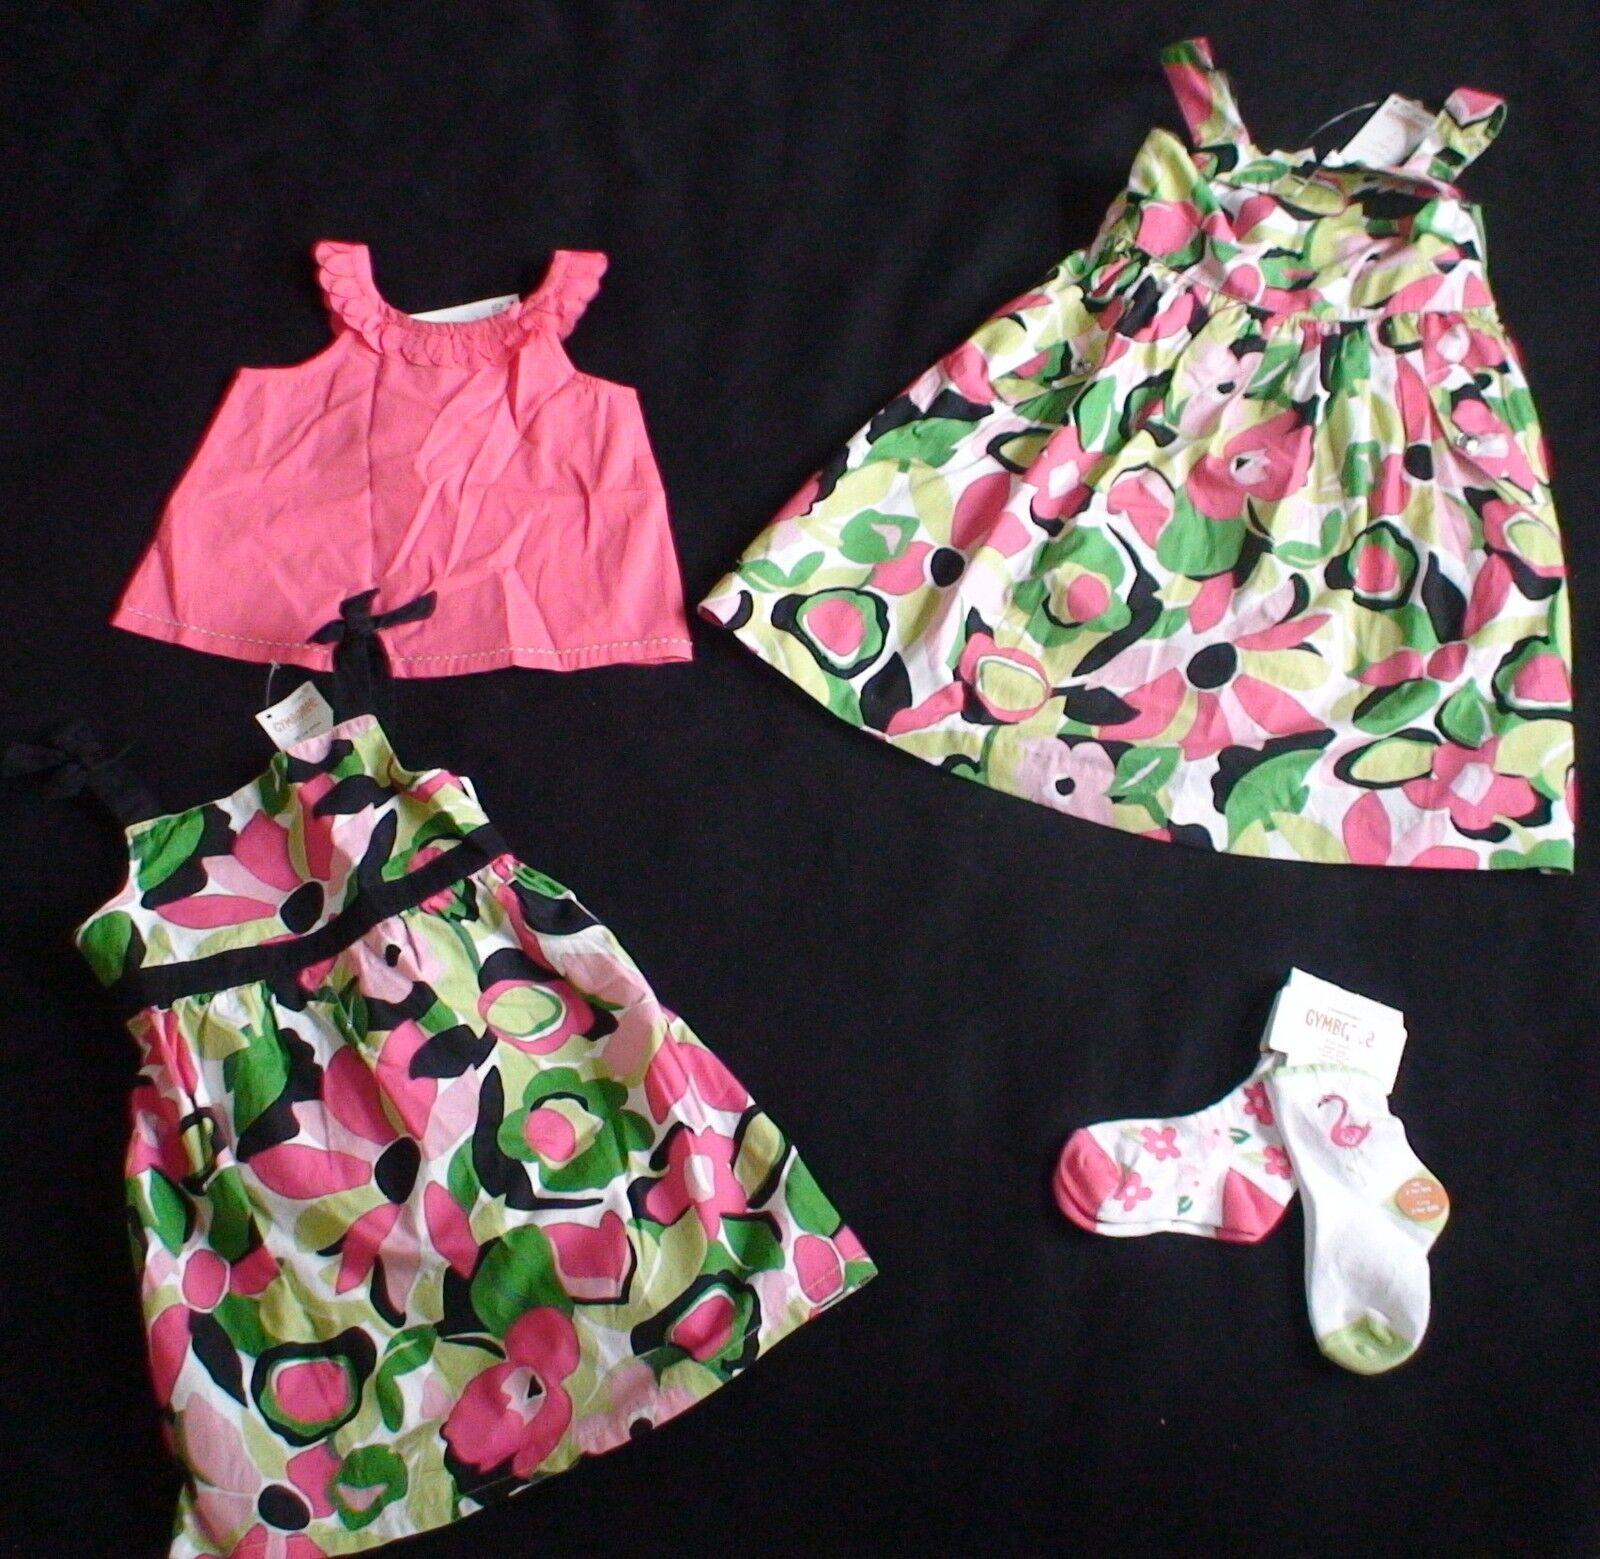 NWT GYMBOREE PALM BEACH PARADISE PINK TANK TOP FLORAL DRESS 2 PCK